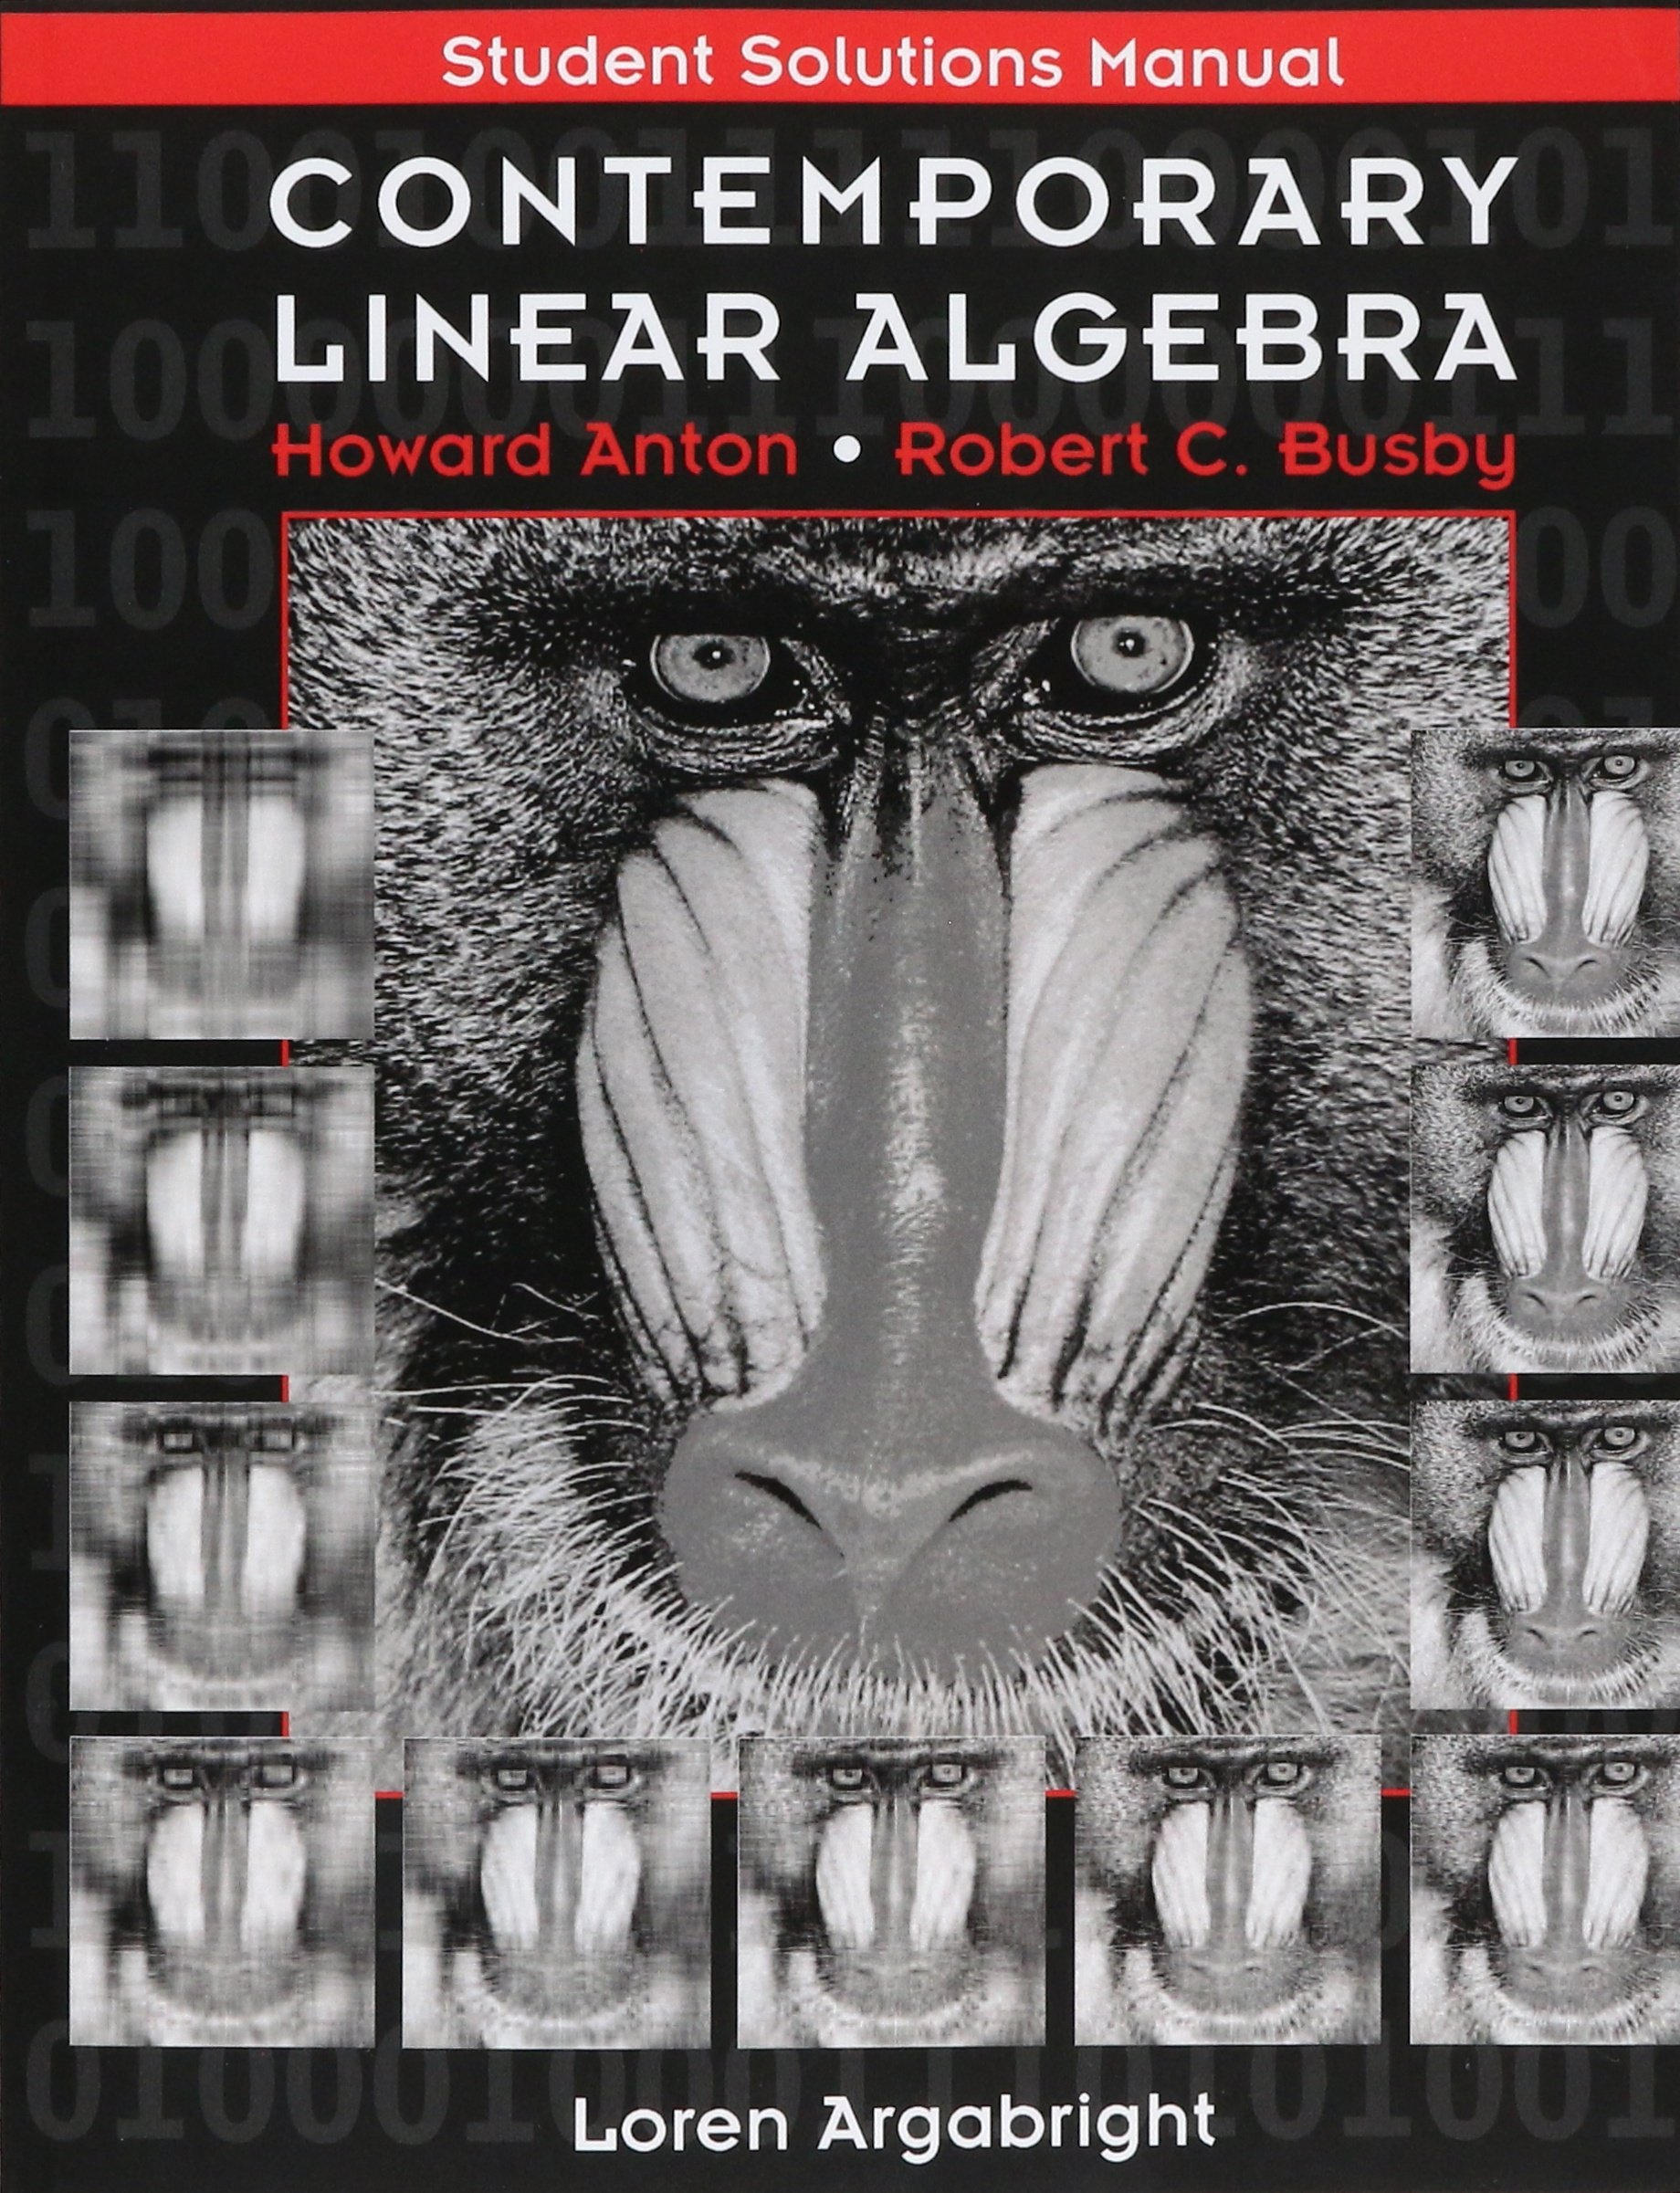 Contemporary Linear Algebra, Student Solutions Manual: Howard Anton, Robert  C. Busby: 9780471170594: Books - Amazon.ca